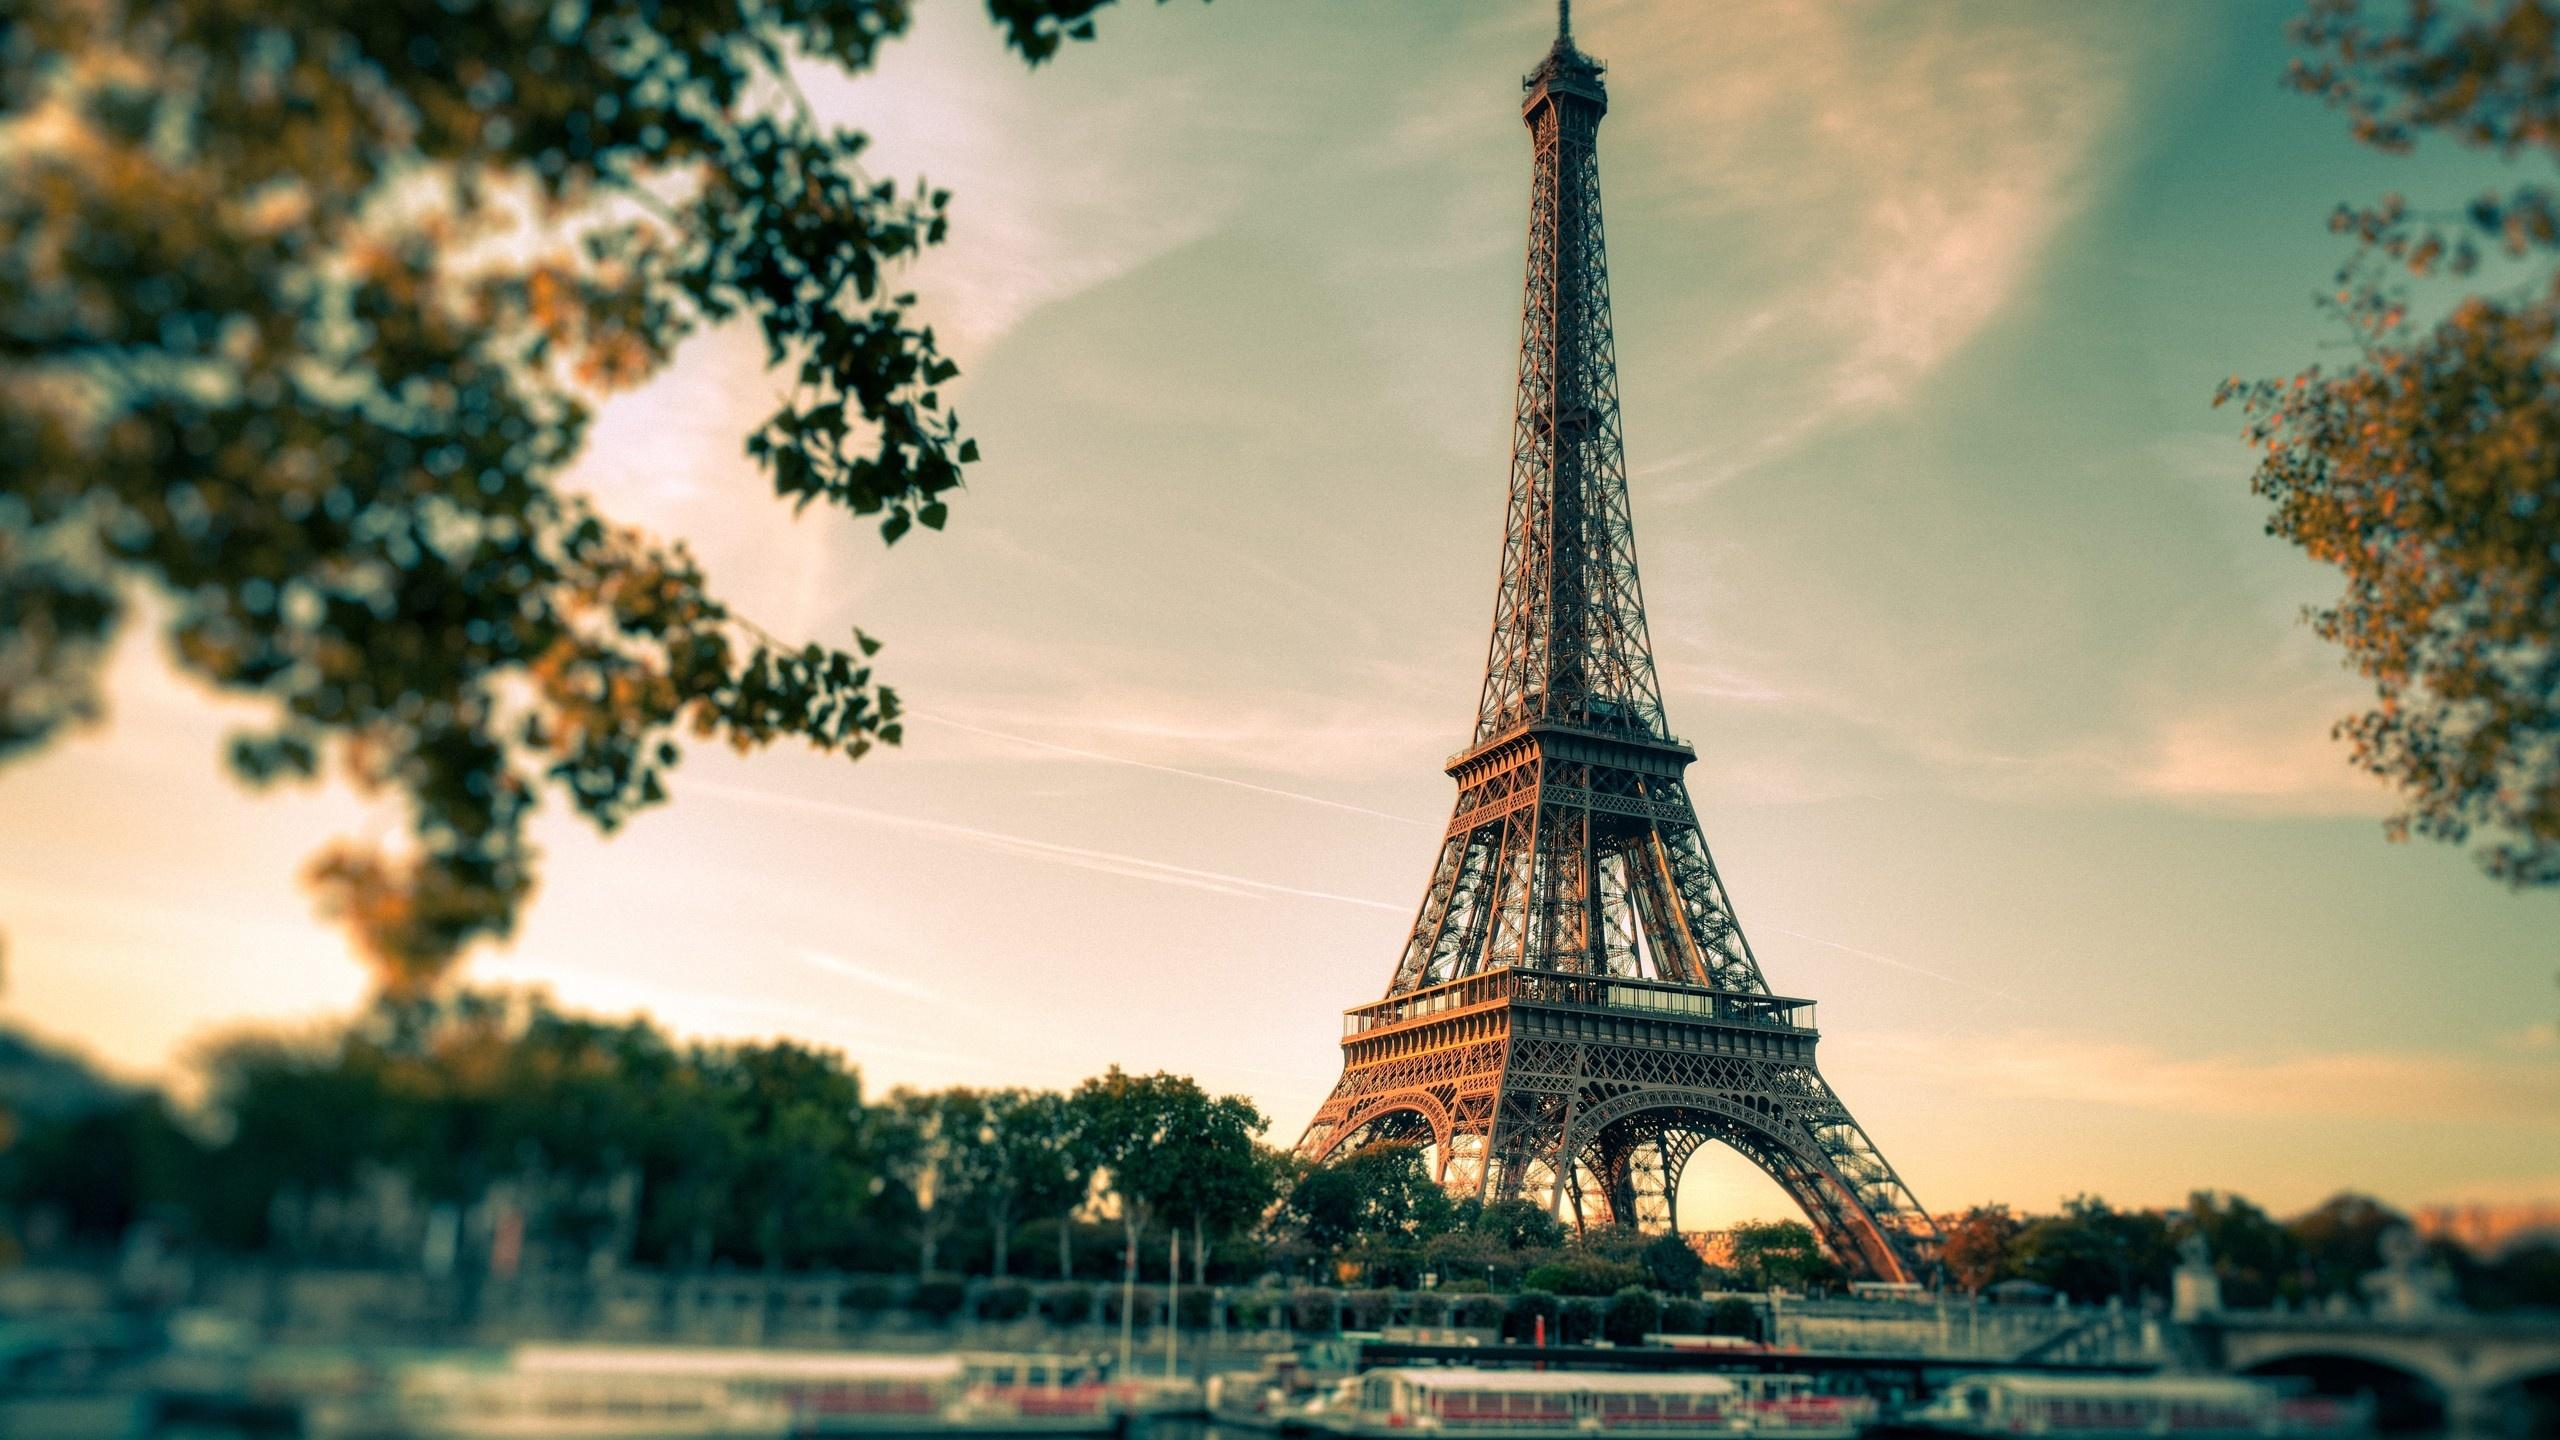 Beautiful Eiffel Tower Paris Tumblr Wallpaper Background Wallpaper 2560x1440